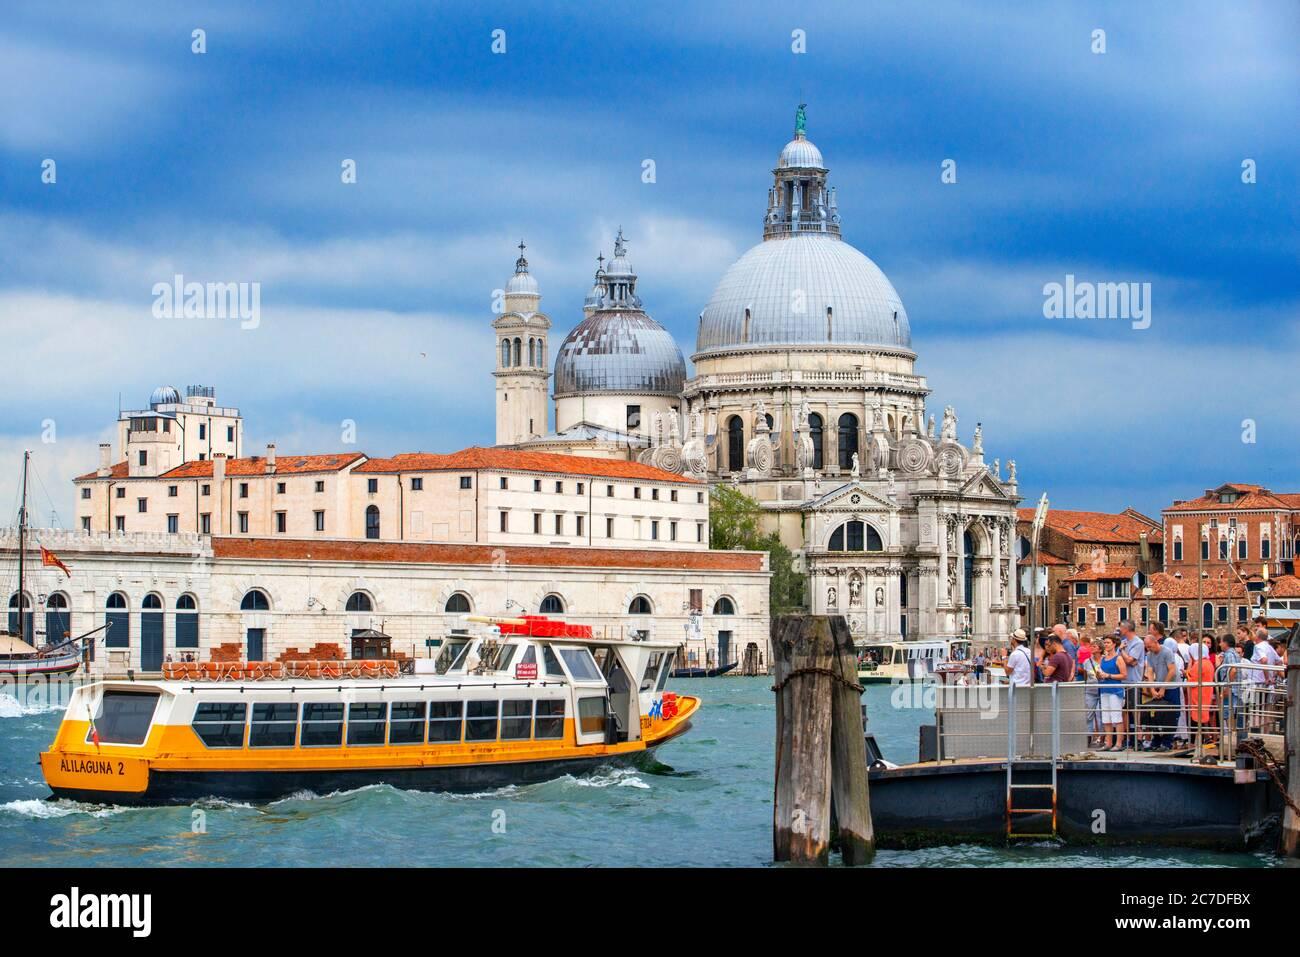 Vaporettos Gondolas, mit Touristen, auf der San Marco Gondelhaltestelle neben der Basilika Santa Maria della Salud, Venedig, UNESCO, Venetien, Italien, Euro Stockfoto